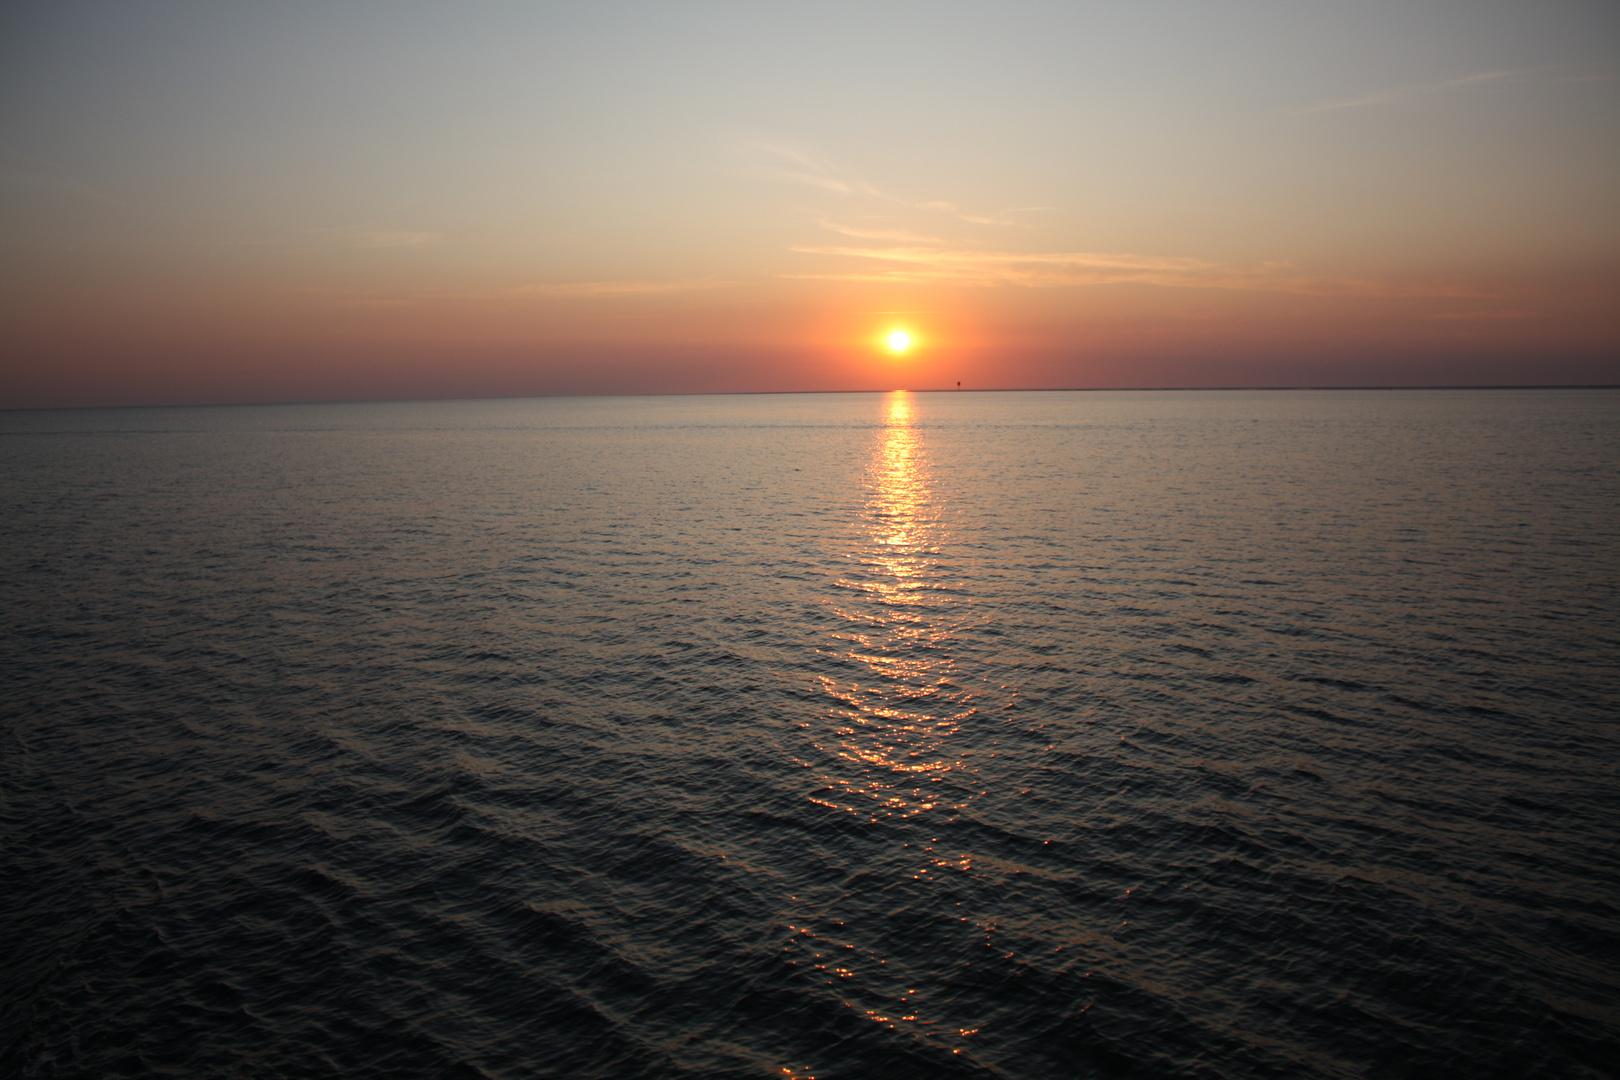 SOLEIL COUCHANT / Sonnenuntergang  BÜSUM NORDSEE